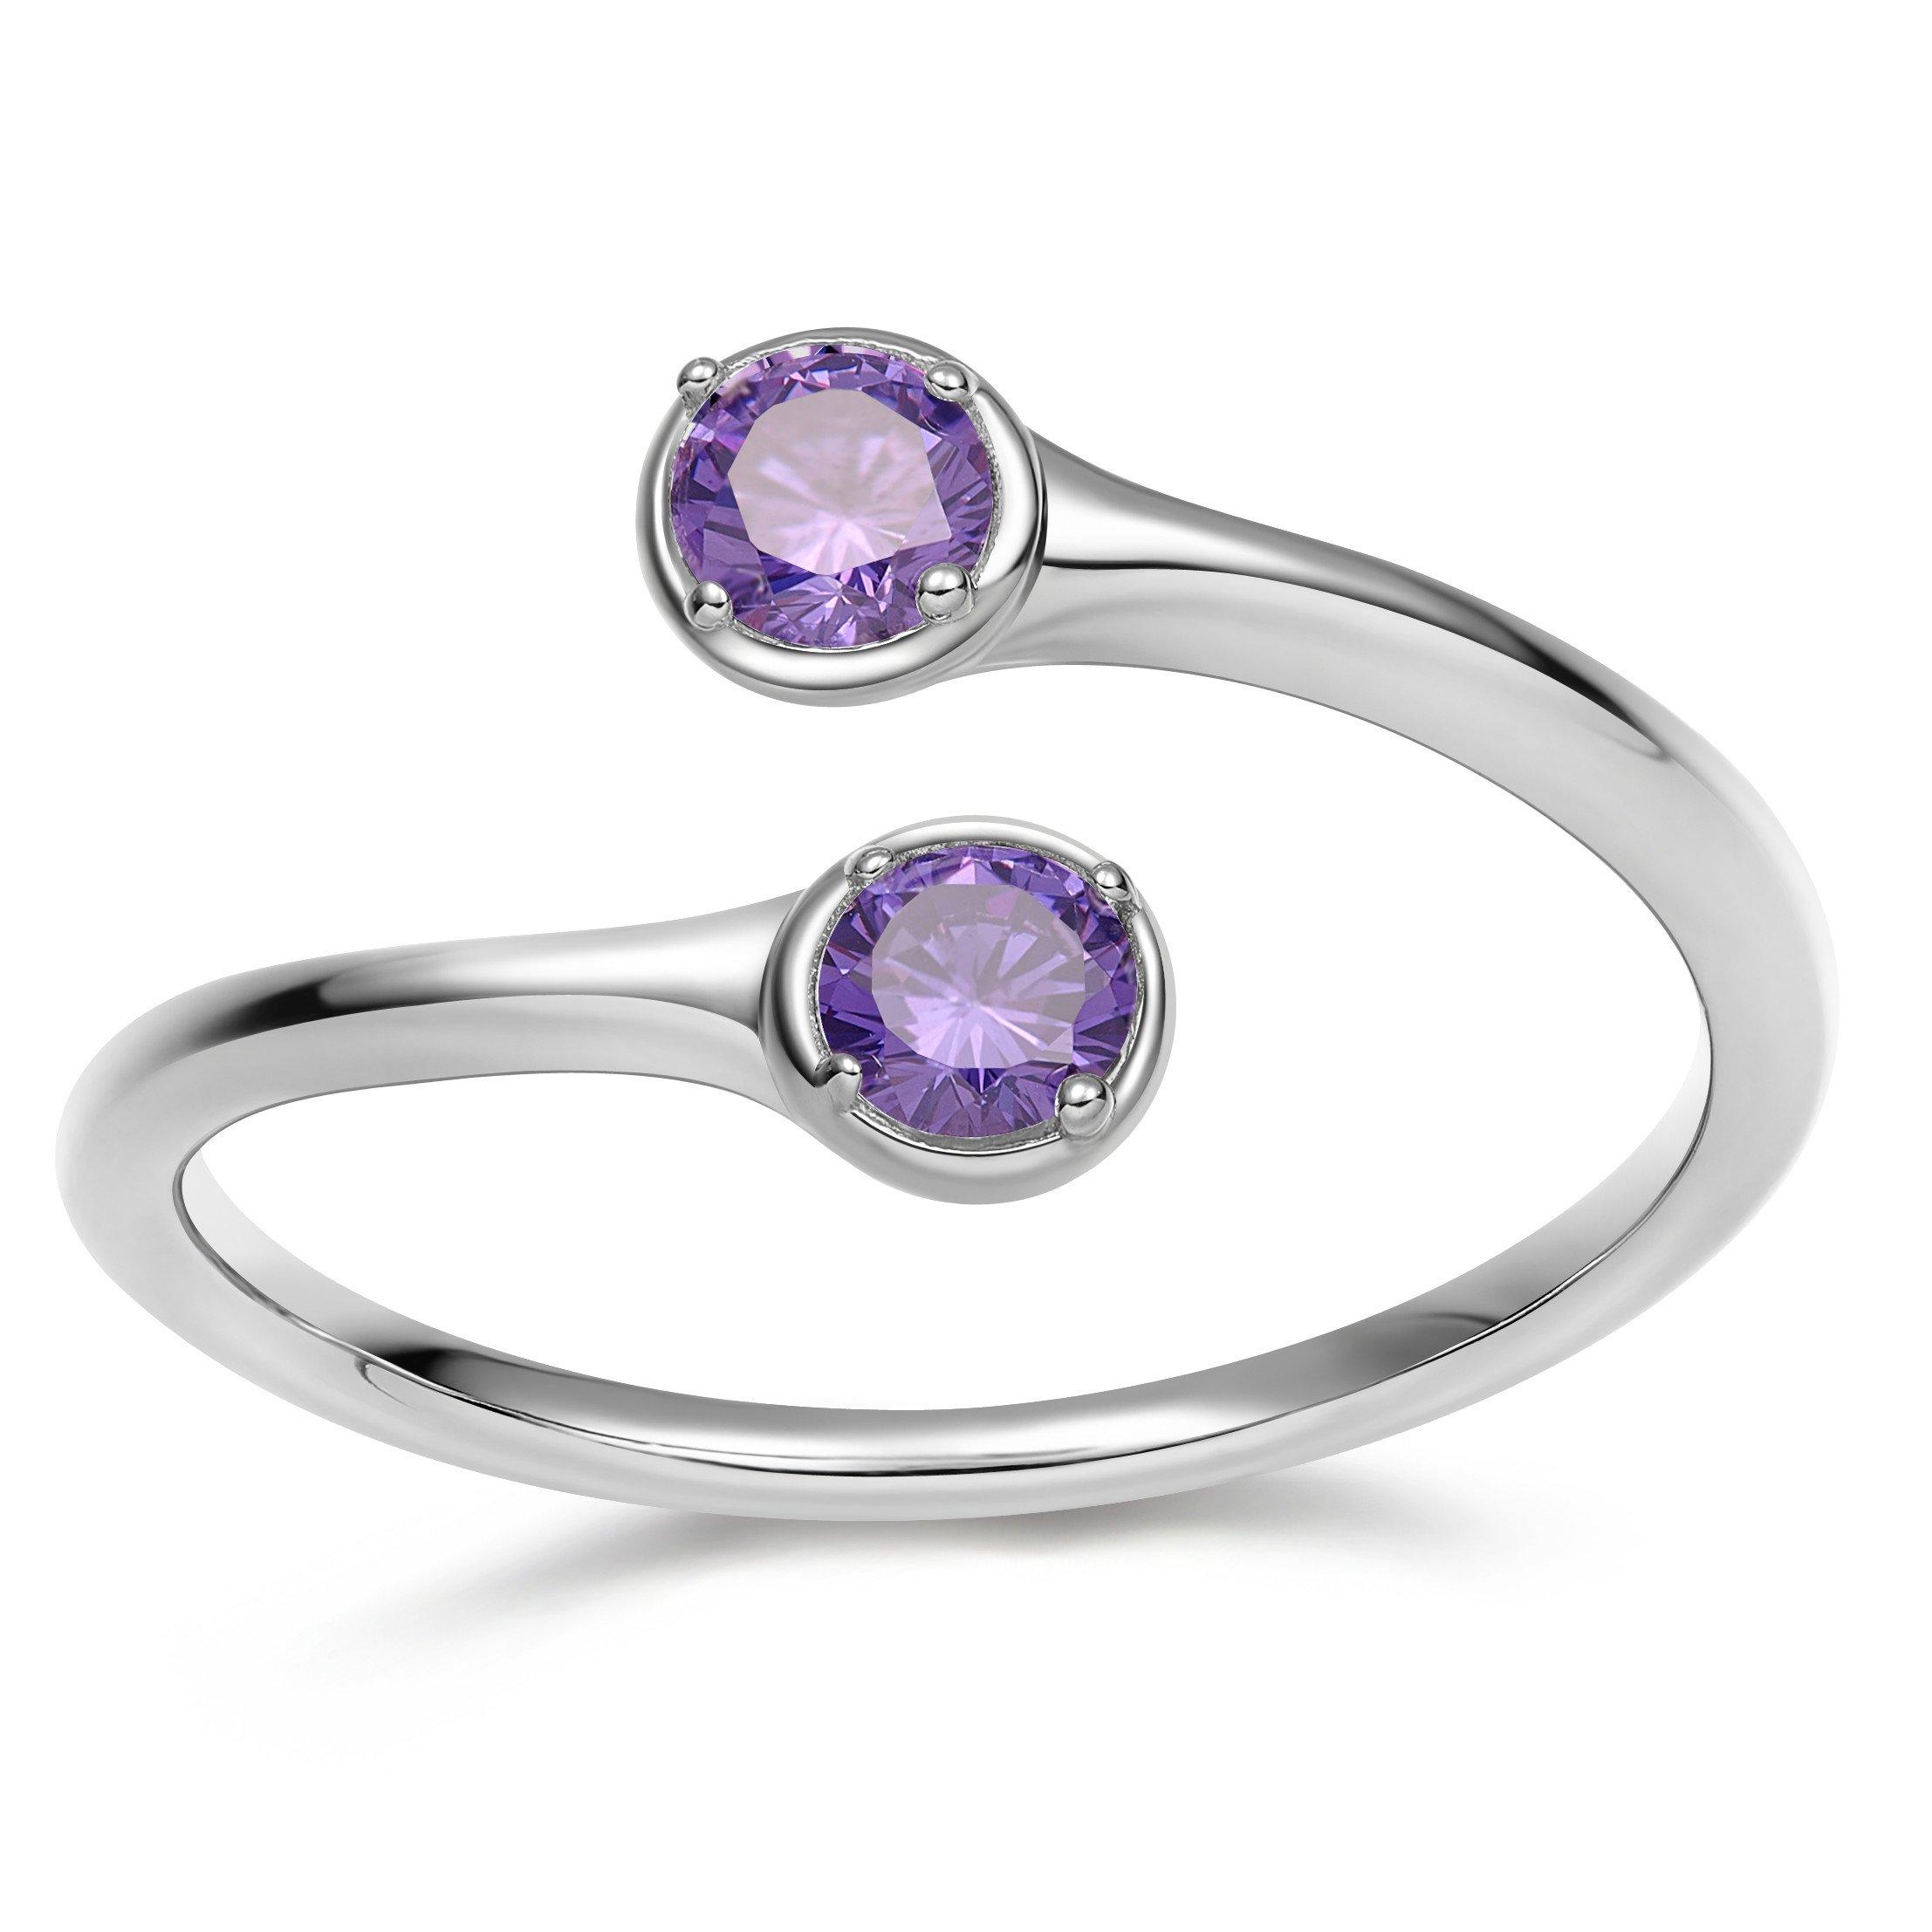 EAMTI Wrap Adjustable 925 Sterling Silver Amethyst Cubic Zirconia February Birthstone Wedding Engagement Ring